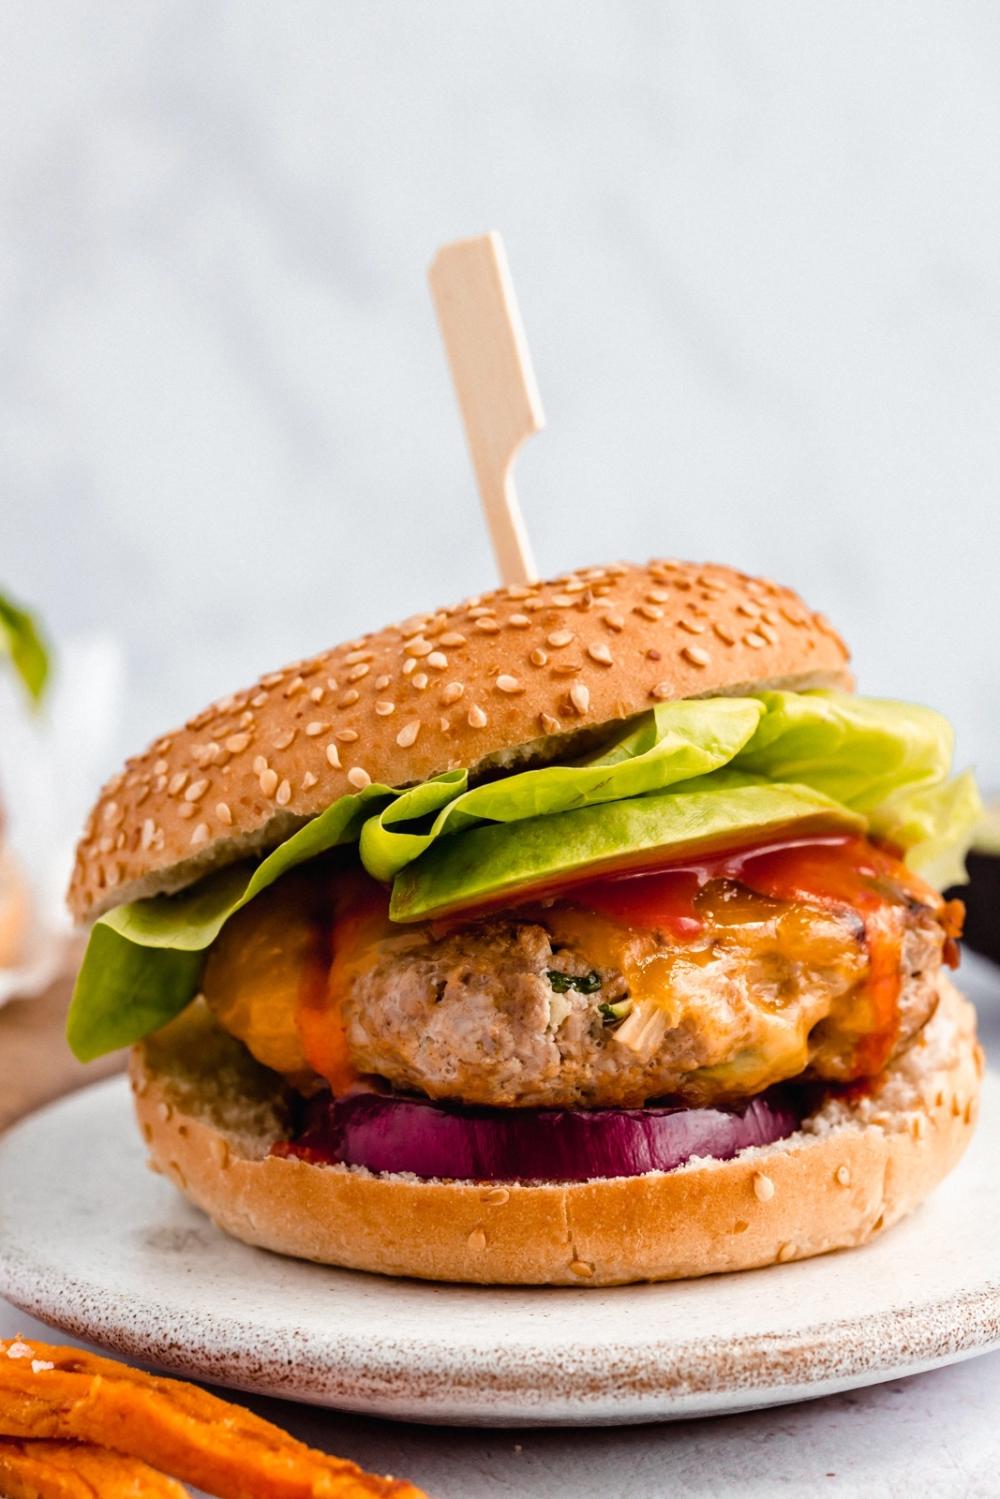 Buffalo Zucchini Chicken Burgers Ambitious Kitchen Recipe Chicken Burgers Grilled Sweet Potato Fries Zucchini